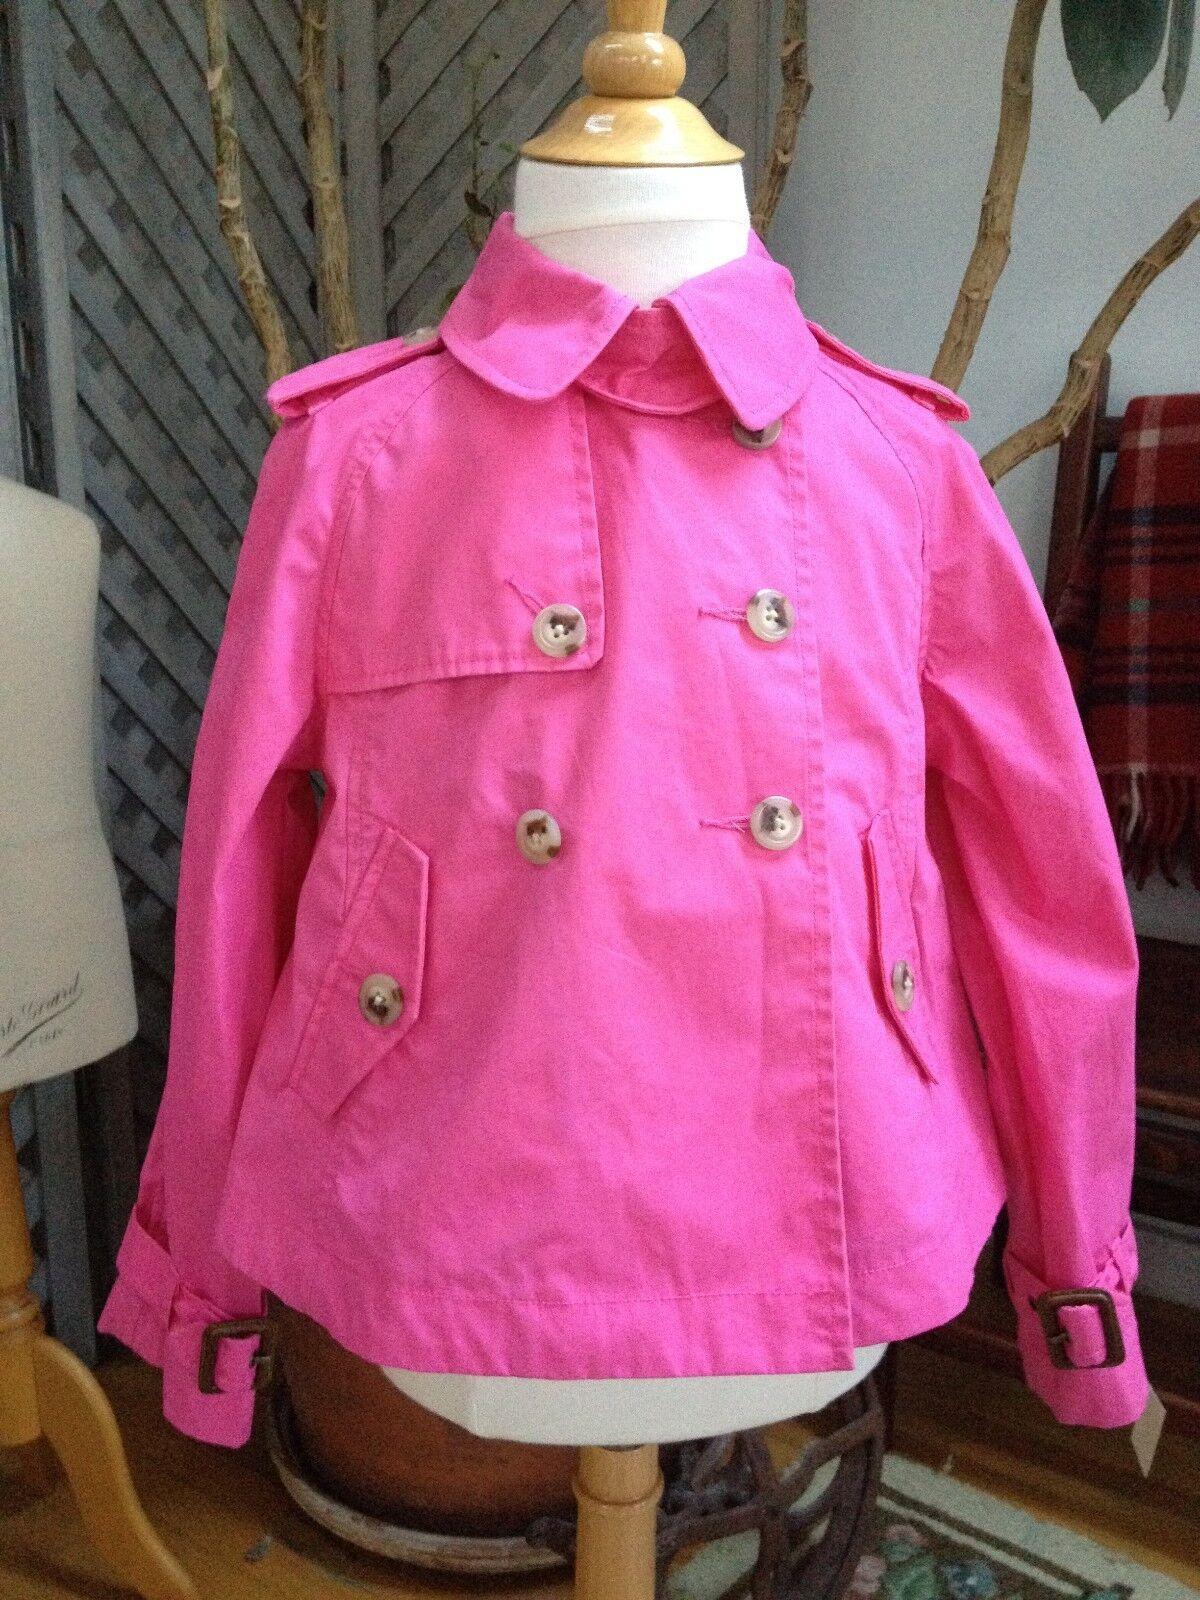 Mädchen 5 RALPH LAUREN RAIN COAT Jacke Kurzer Trenchcoat MILITARY Style Hot PINK Swing